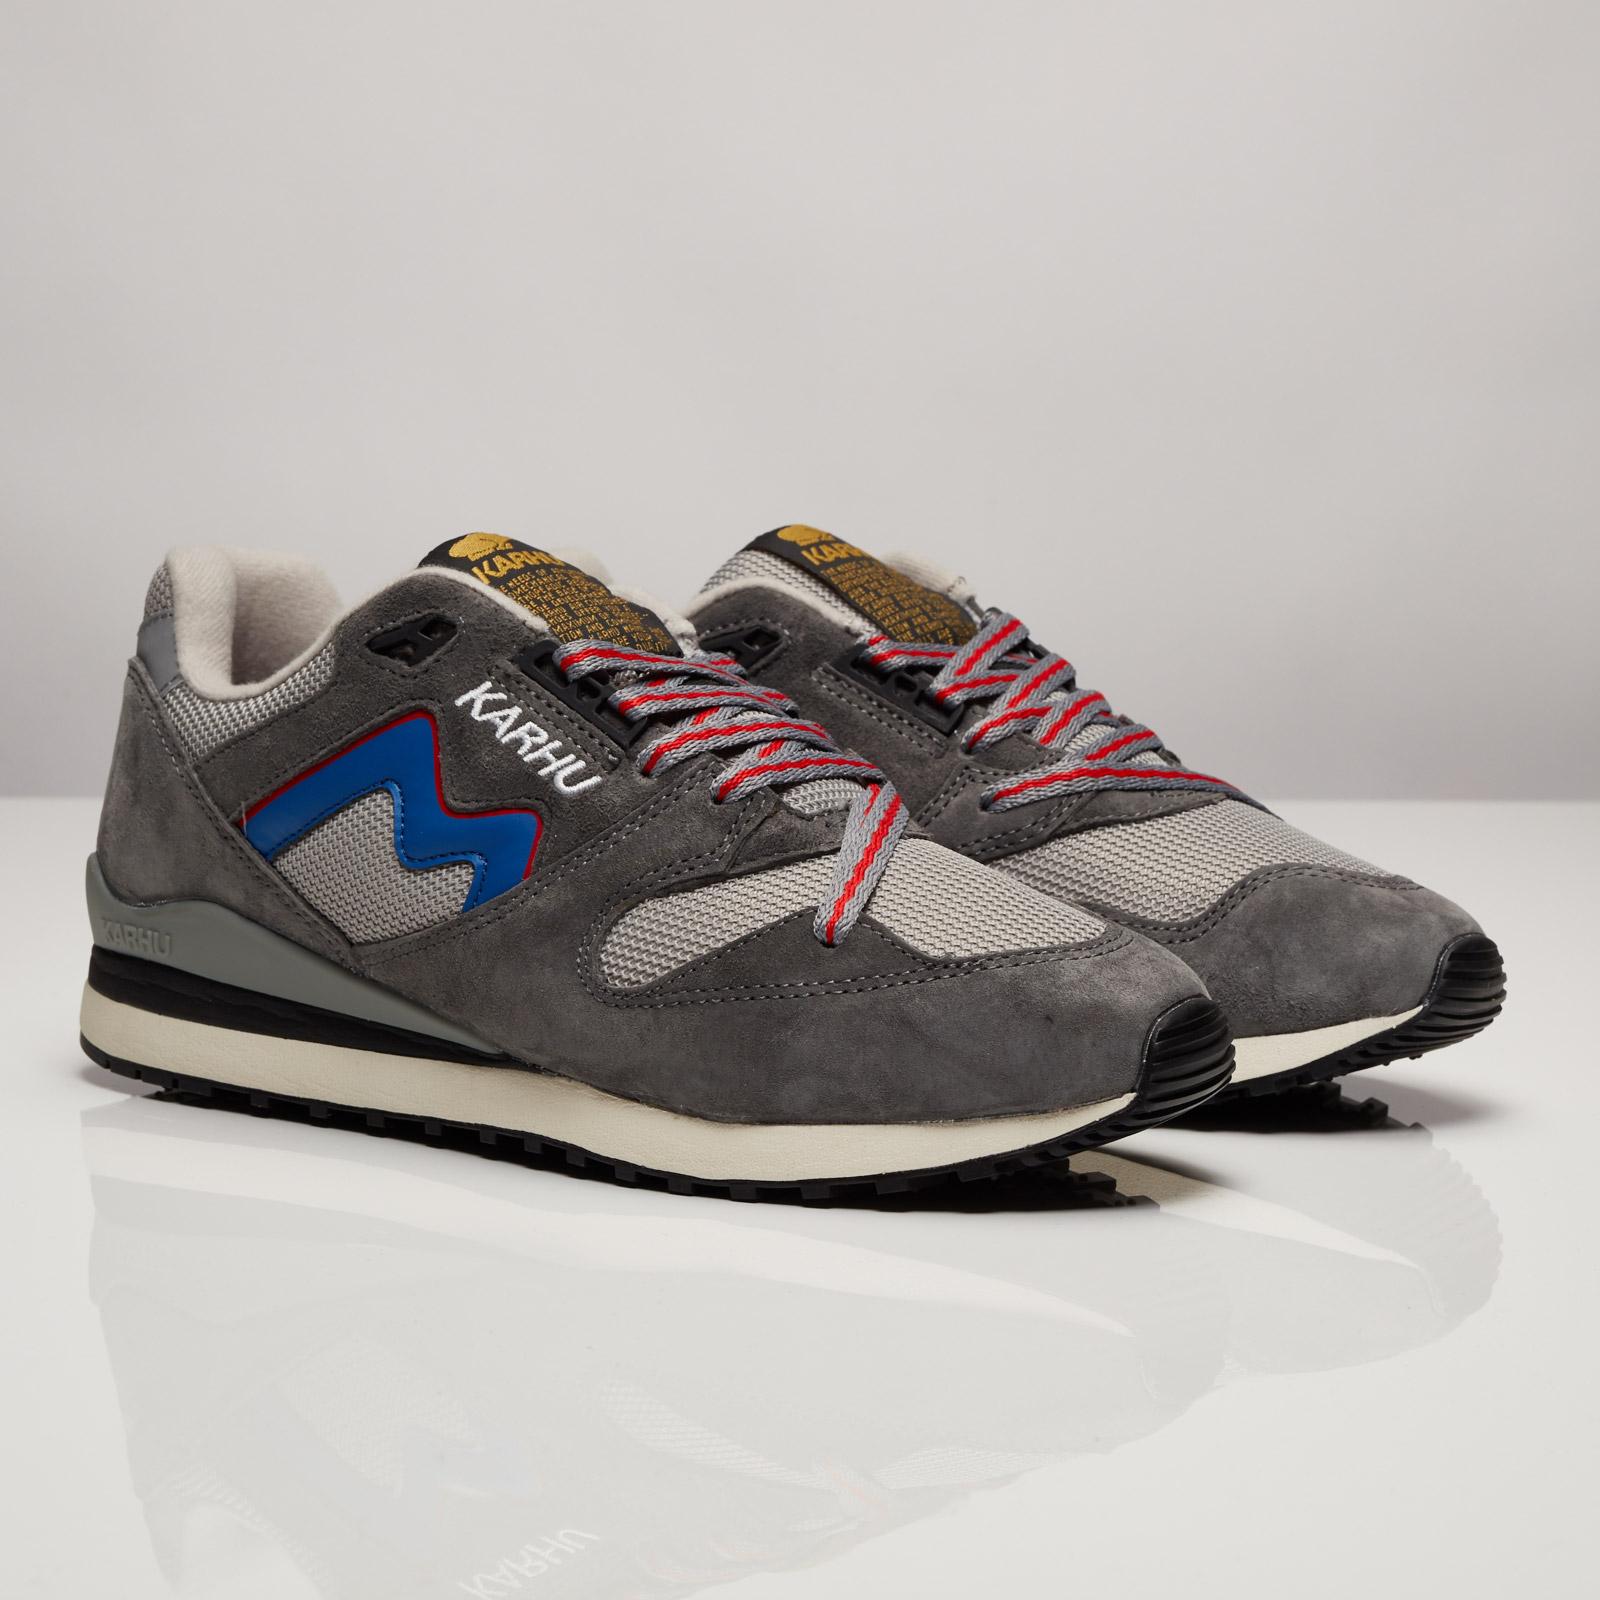 Mens Synchron Classic Sneakers Karhu LBRCHp5h